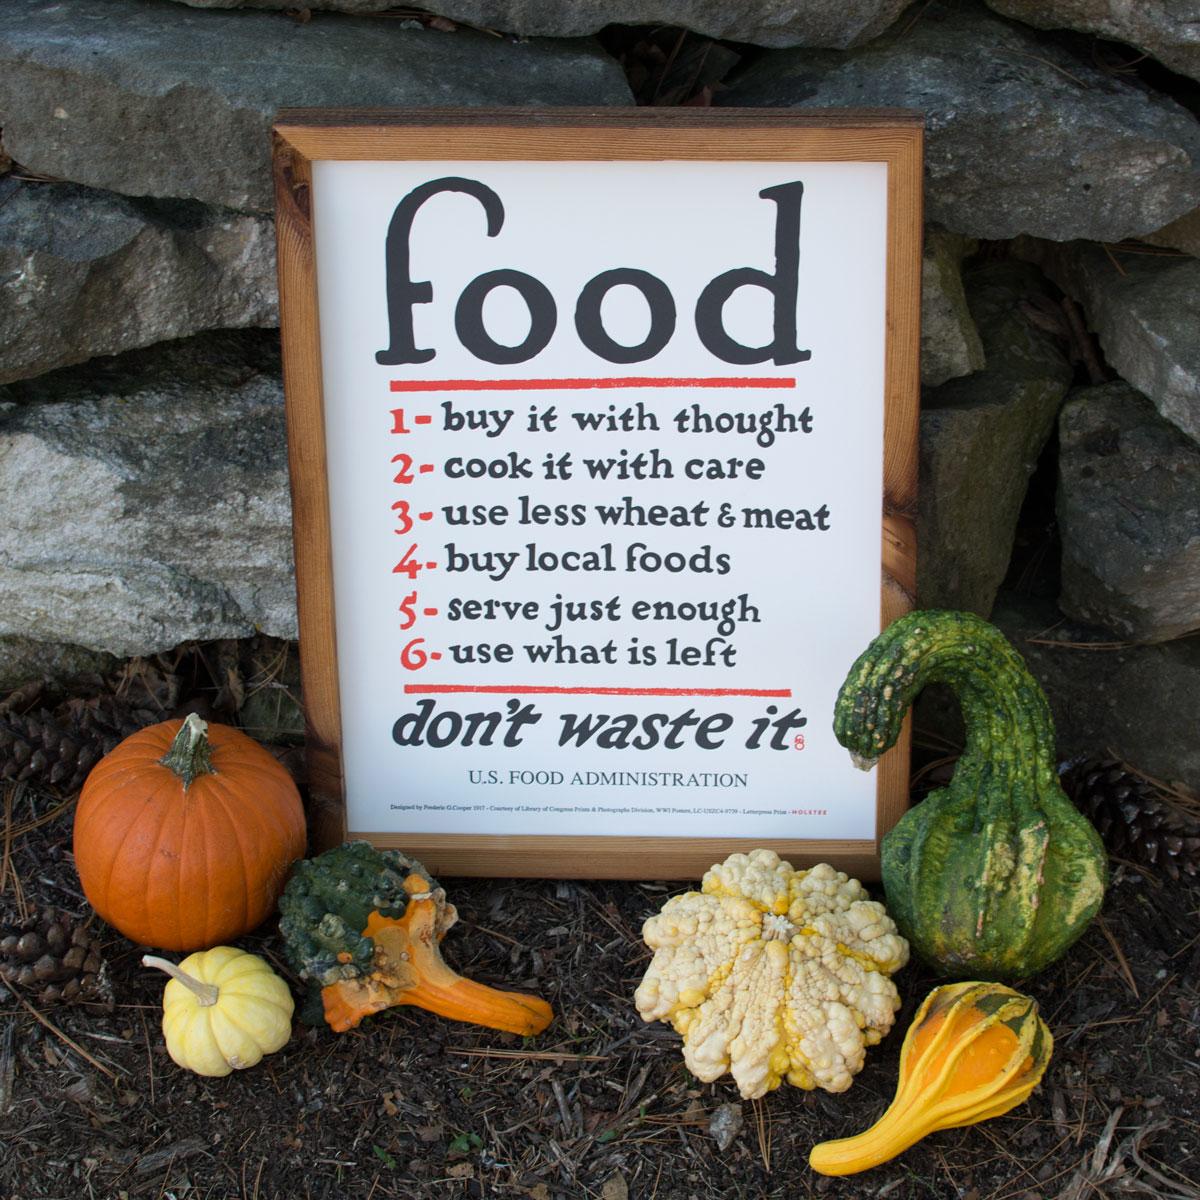 lg-food-rules-stone-wall-straight-1200px.jpg